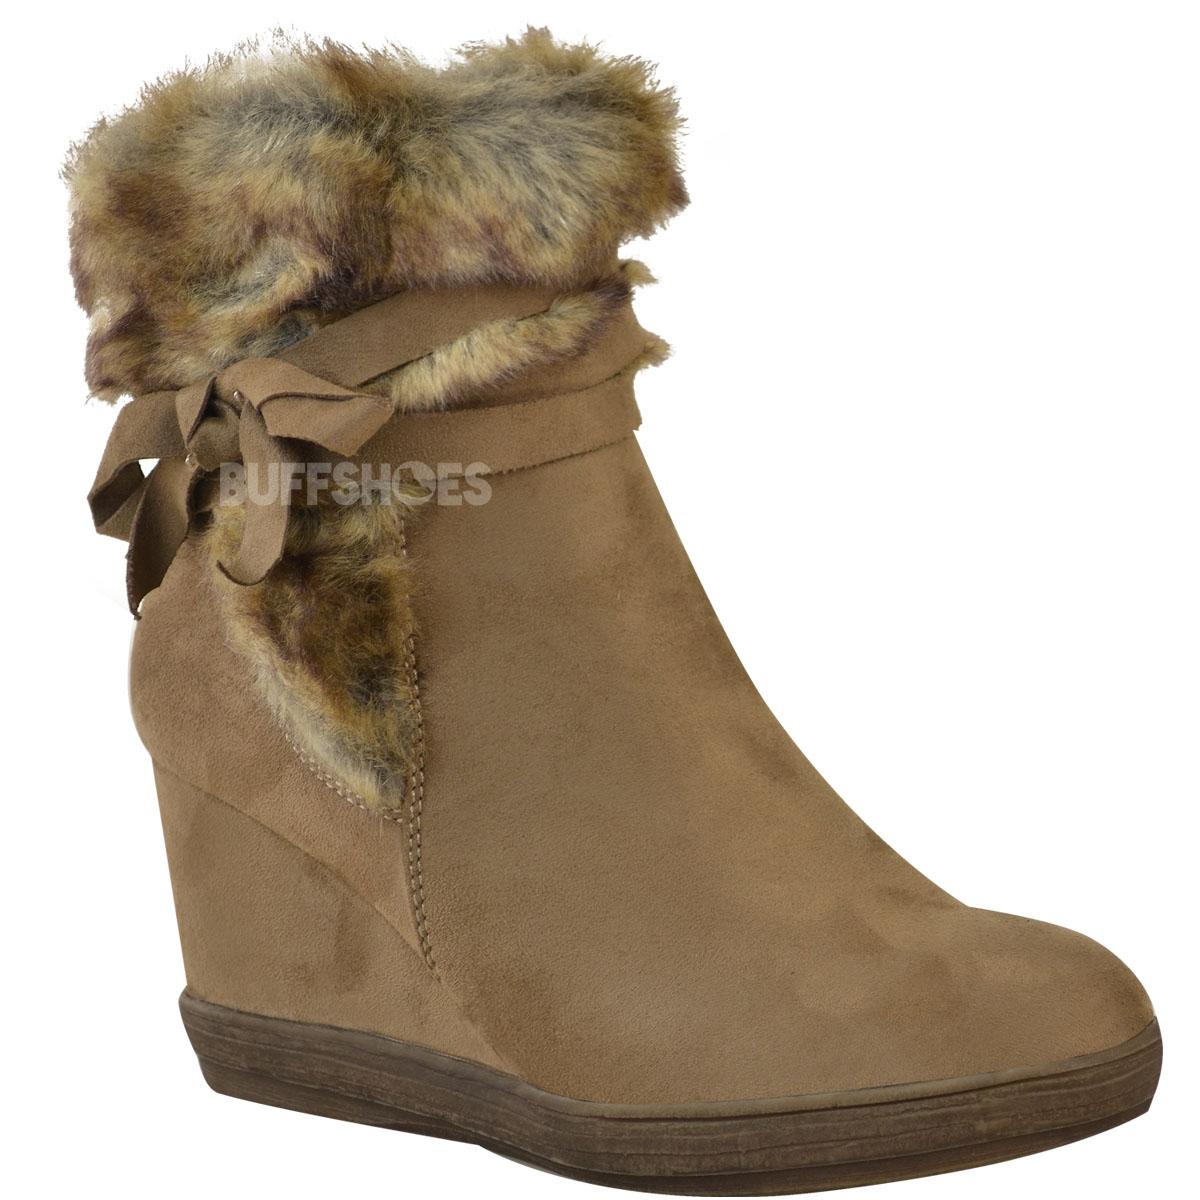 Womens Ladies Winter Faux Fur Wedge Platform Ankle Boots ...